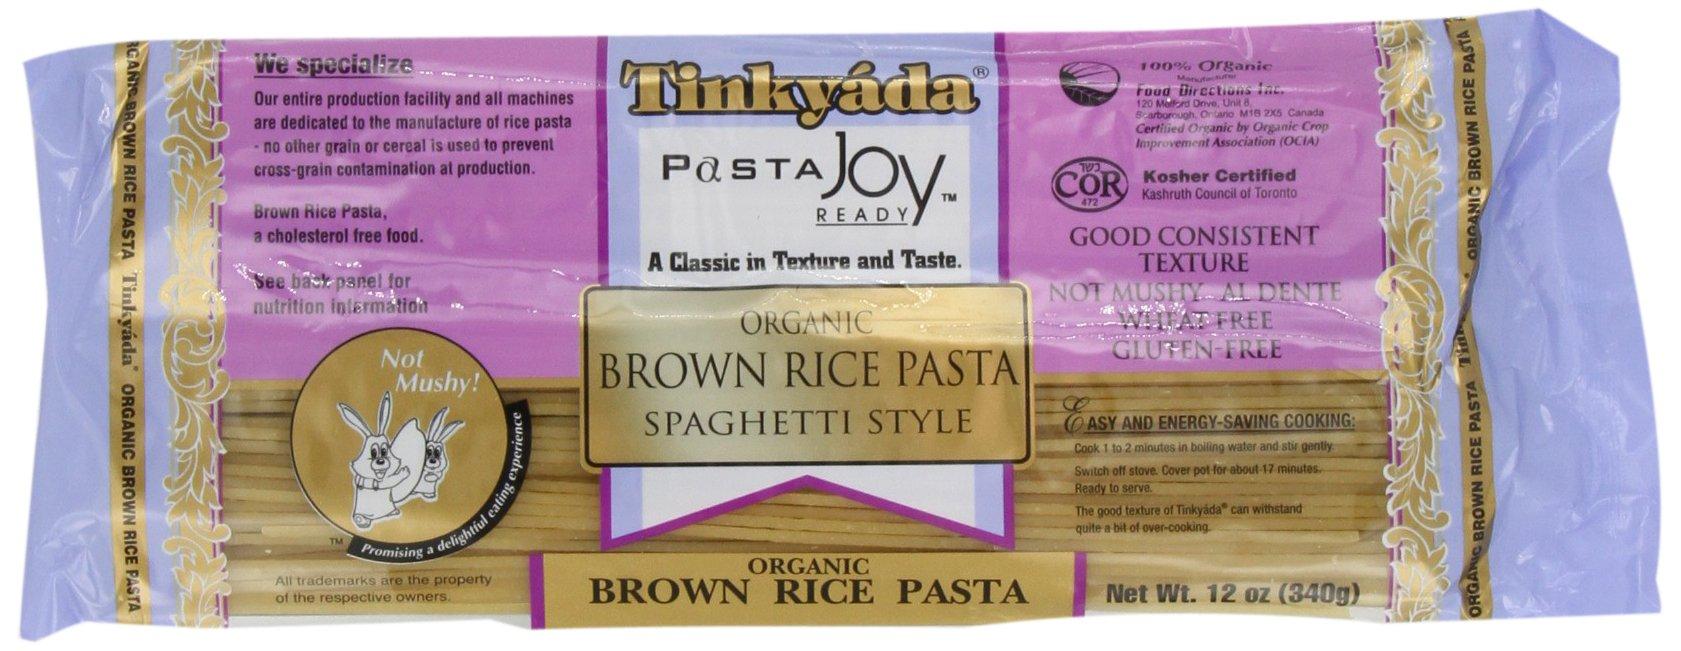 Tinkyada Brown Rice Pasta, Spaghetti, Organic, 12-Ounce (Pack of 6) by Tinkyada